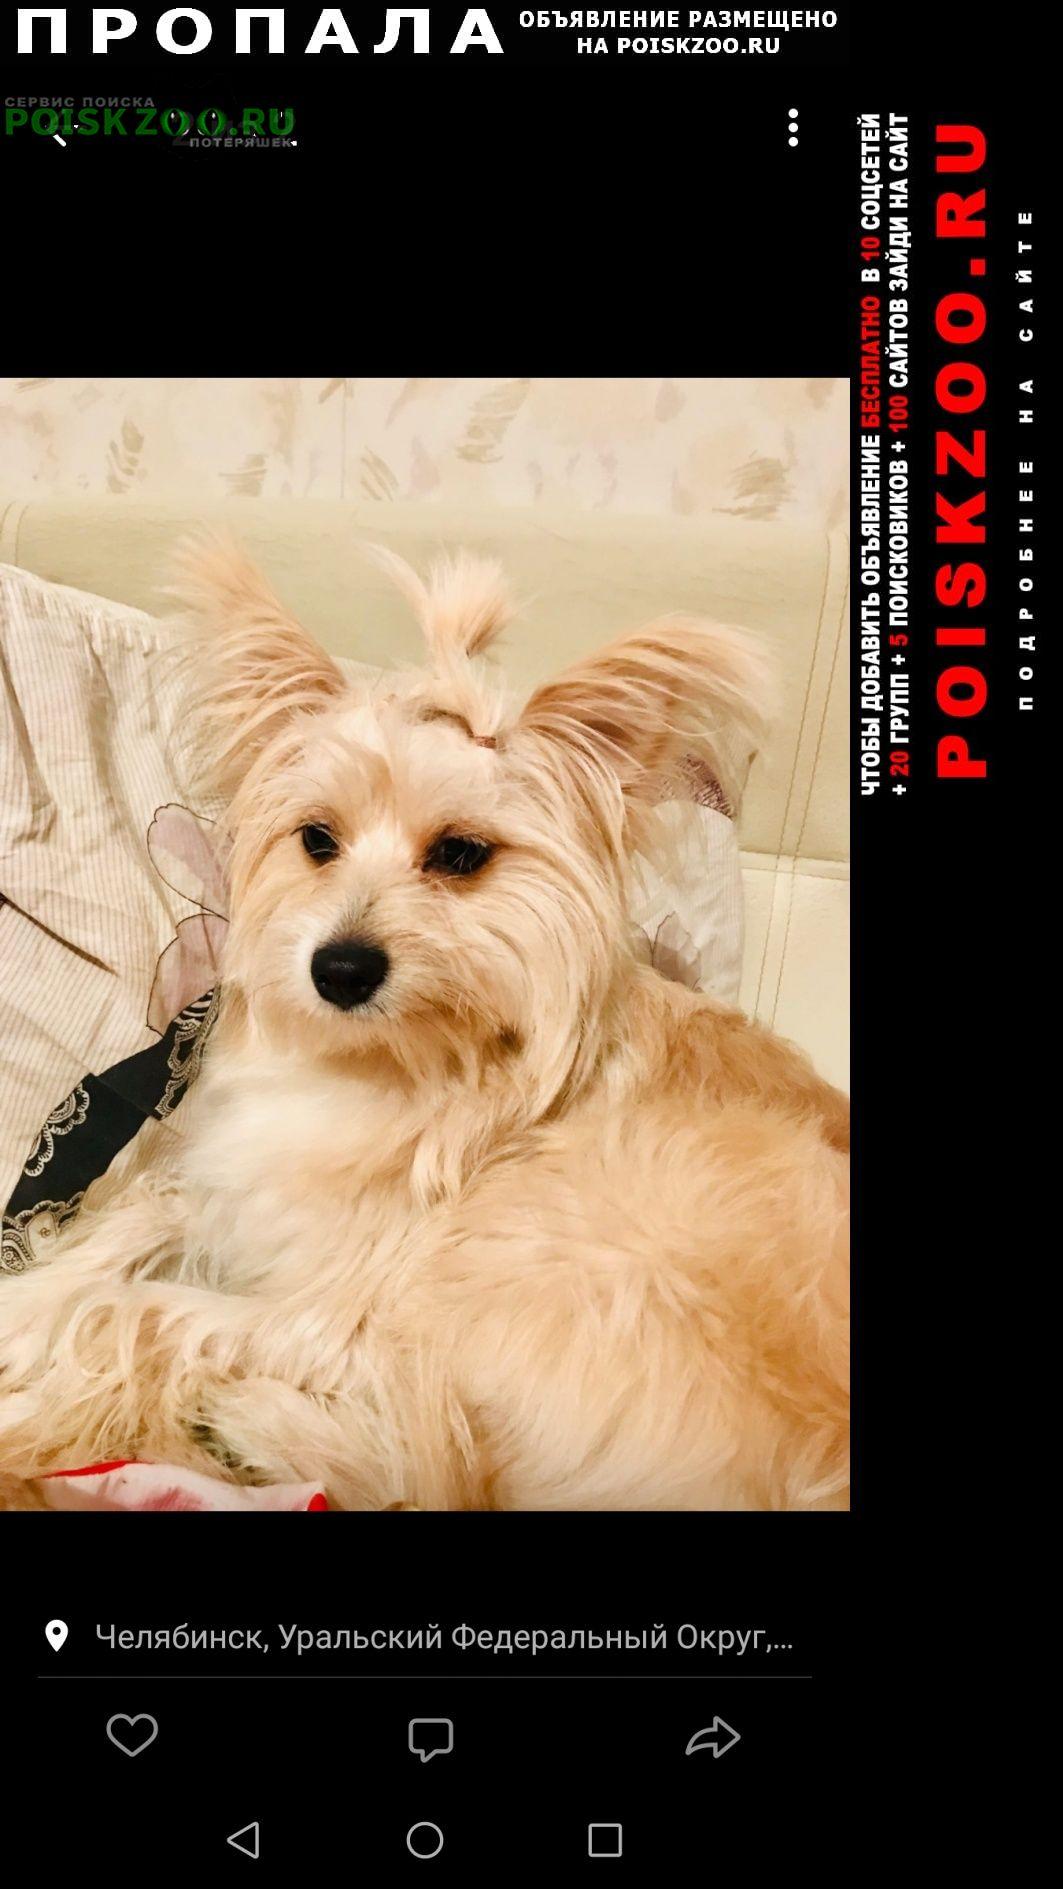 Пропала собака зову омела Челябинск